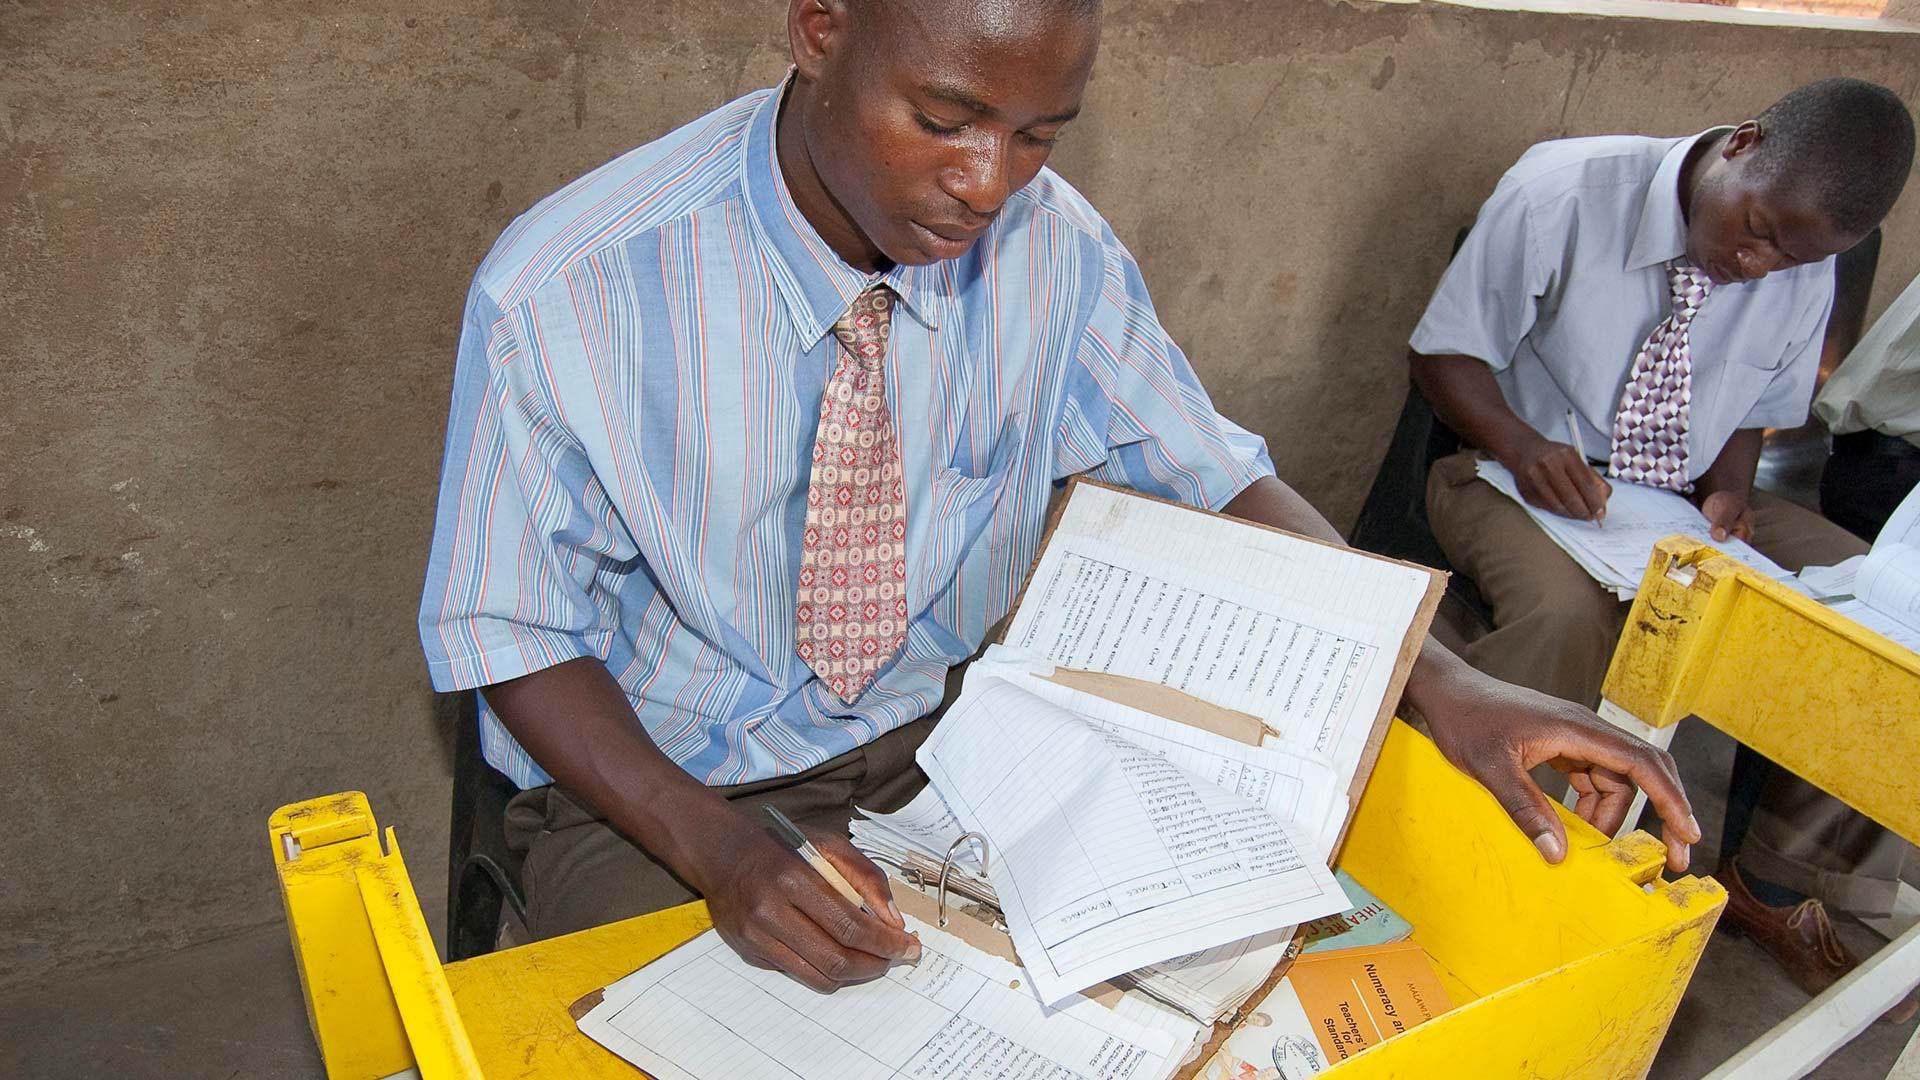 Malawian children doing homework at desks